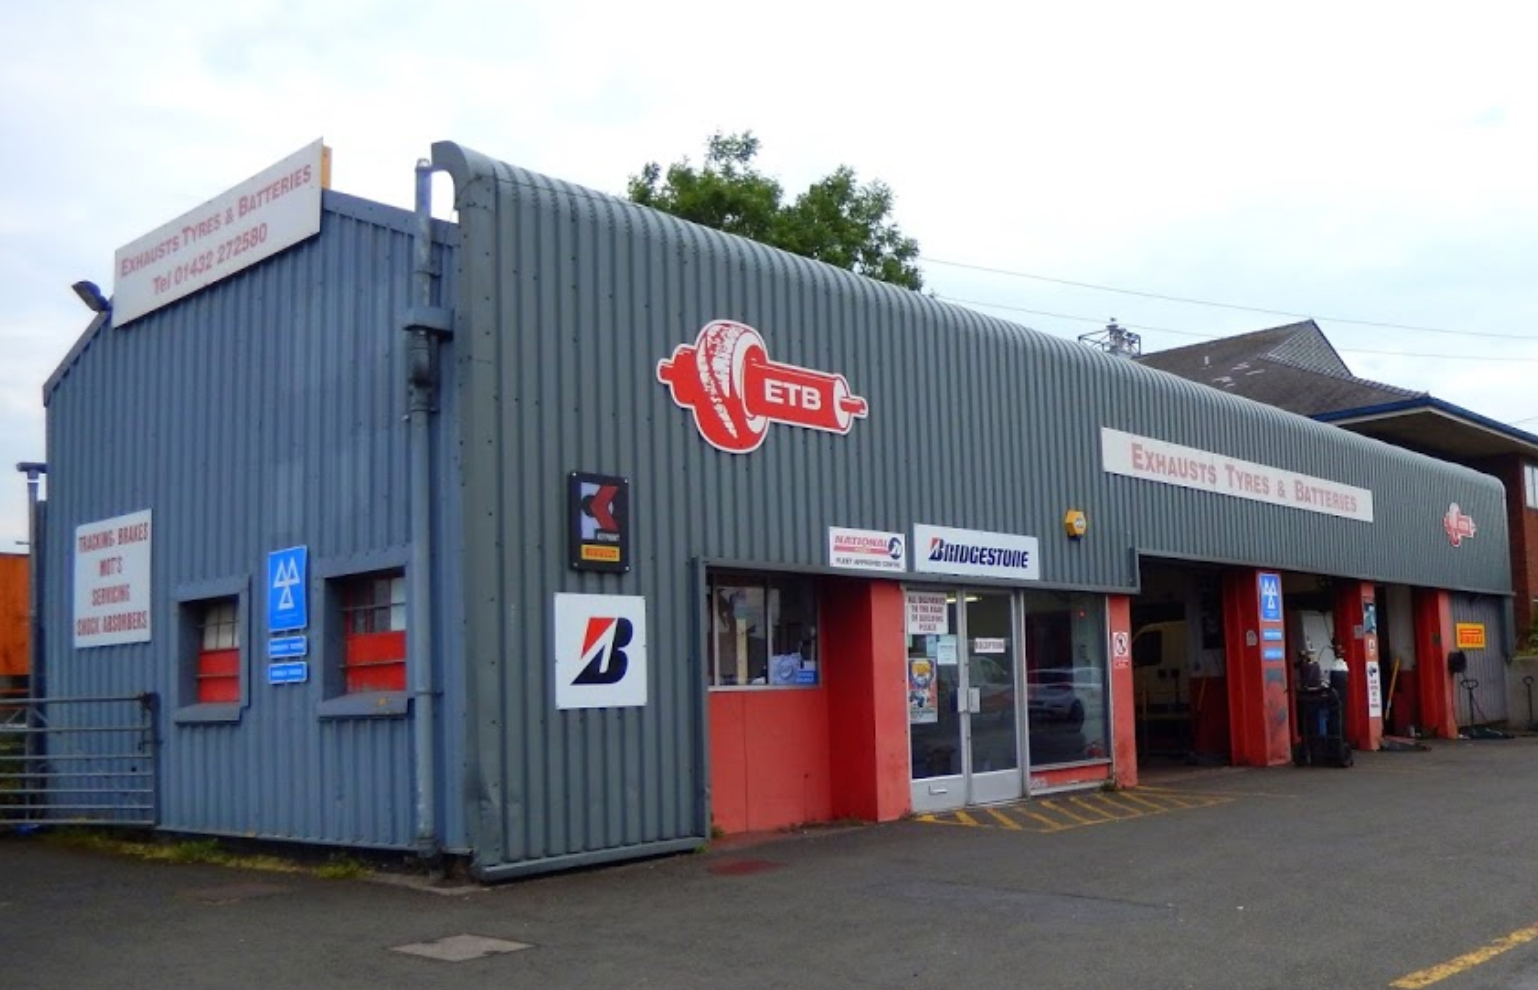 ETB - Exhaust Tyres & Batteries Hereford